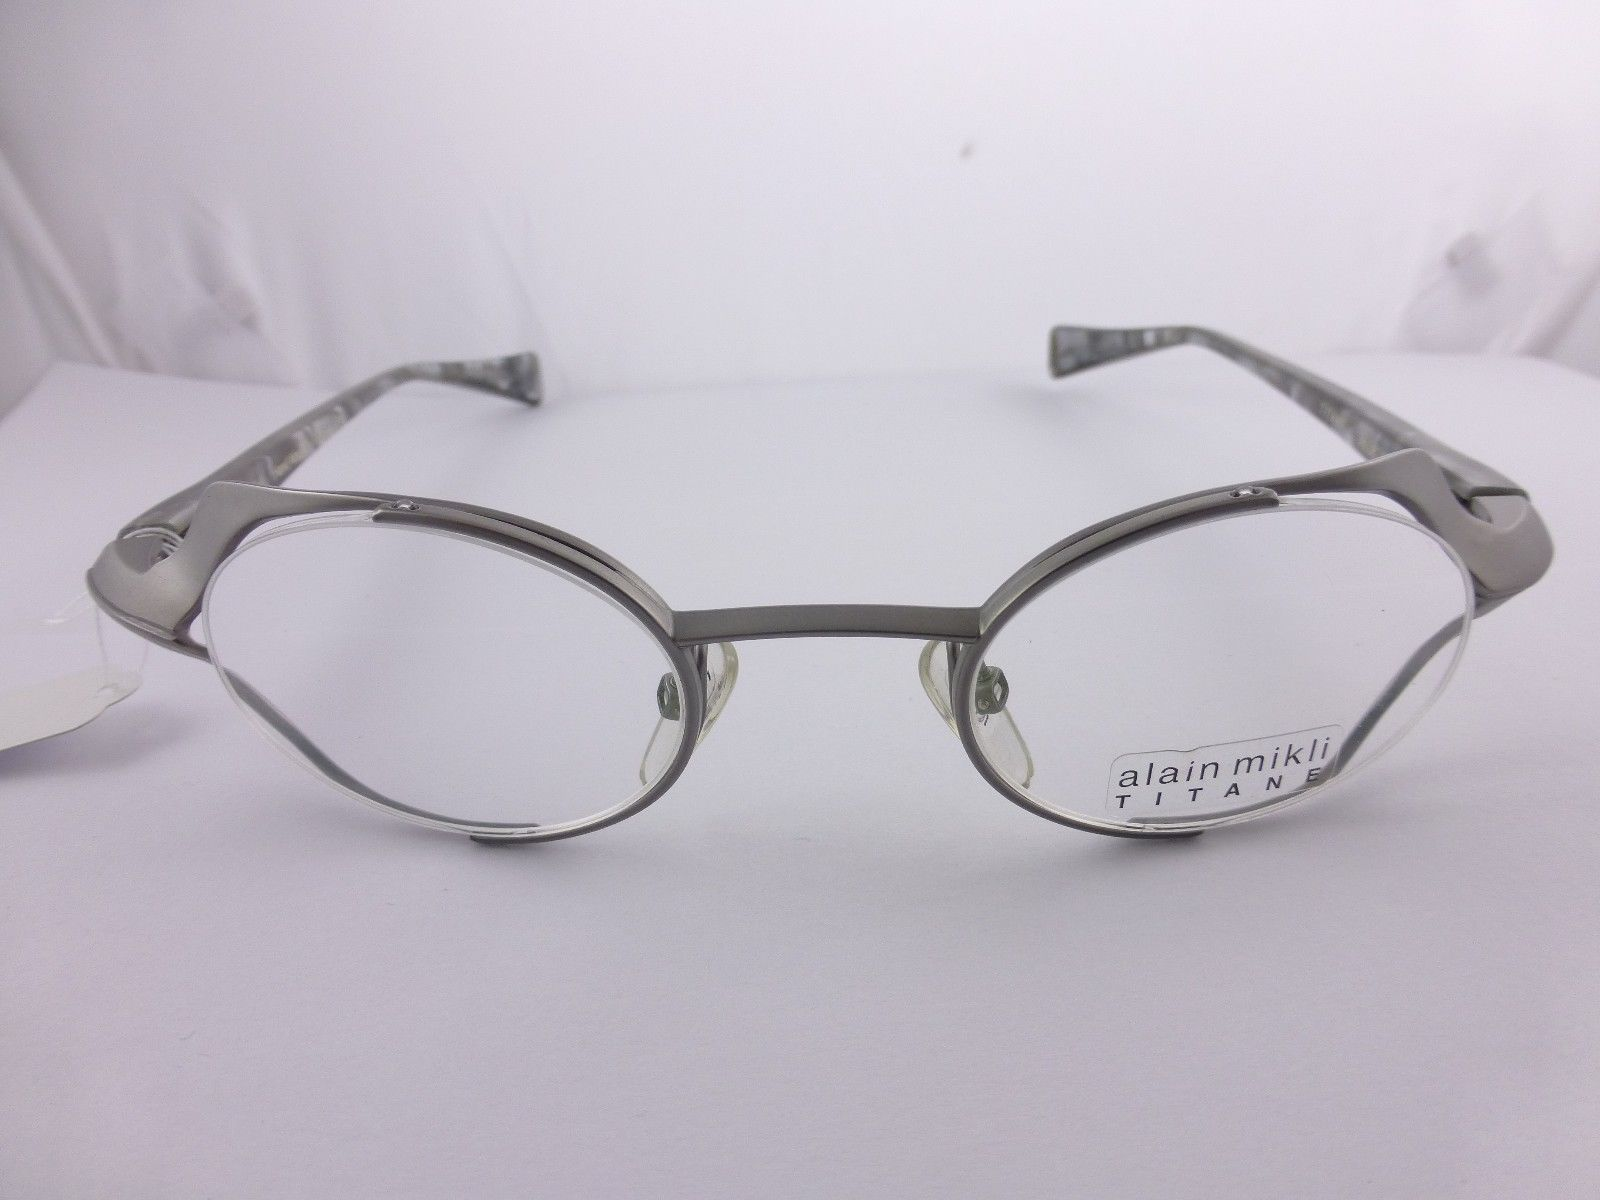 Custom Made Eyeglass Frames New York : Alain Mikli Fashion Great Eyeglasses Grey Hand Made MOD ...